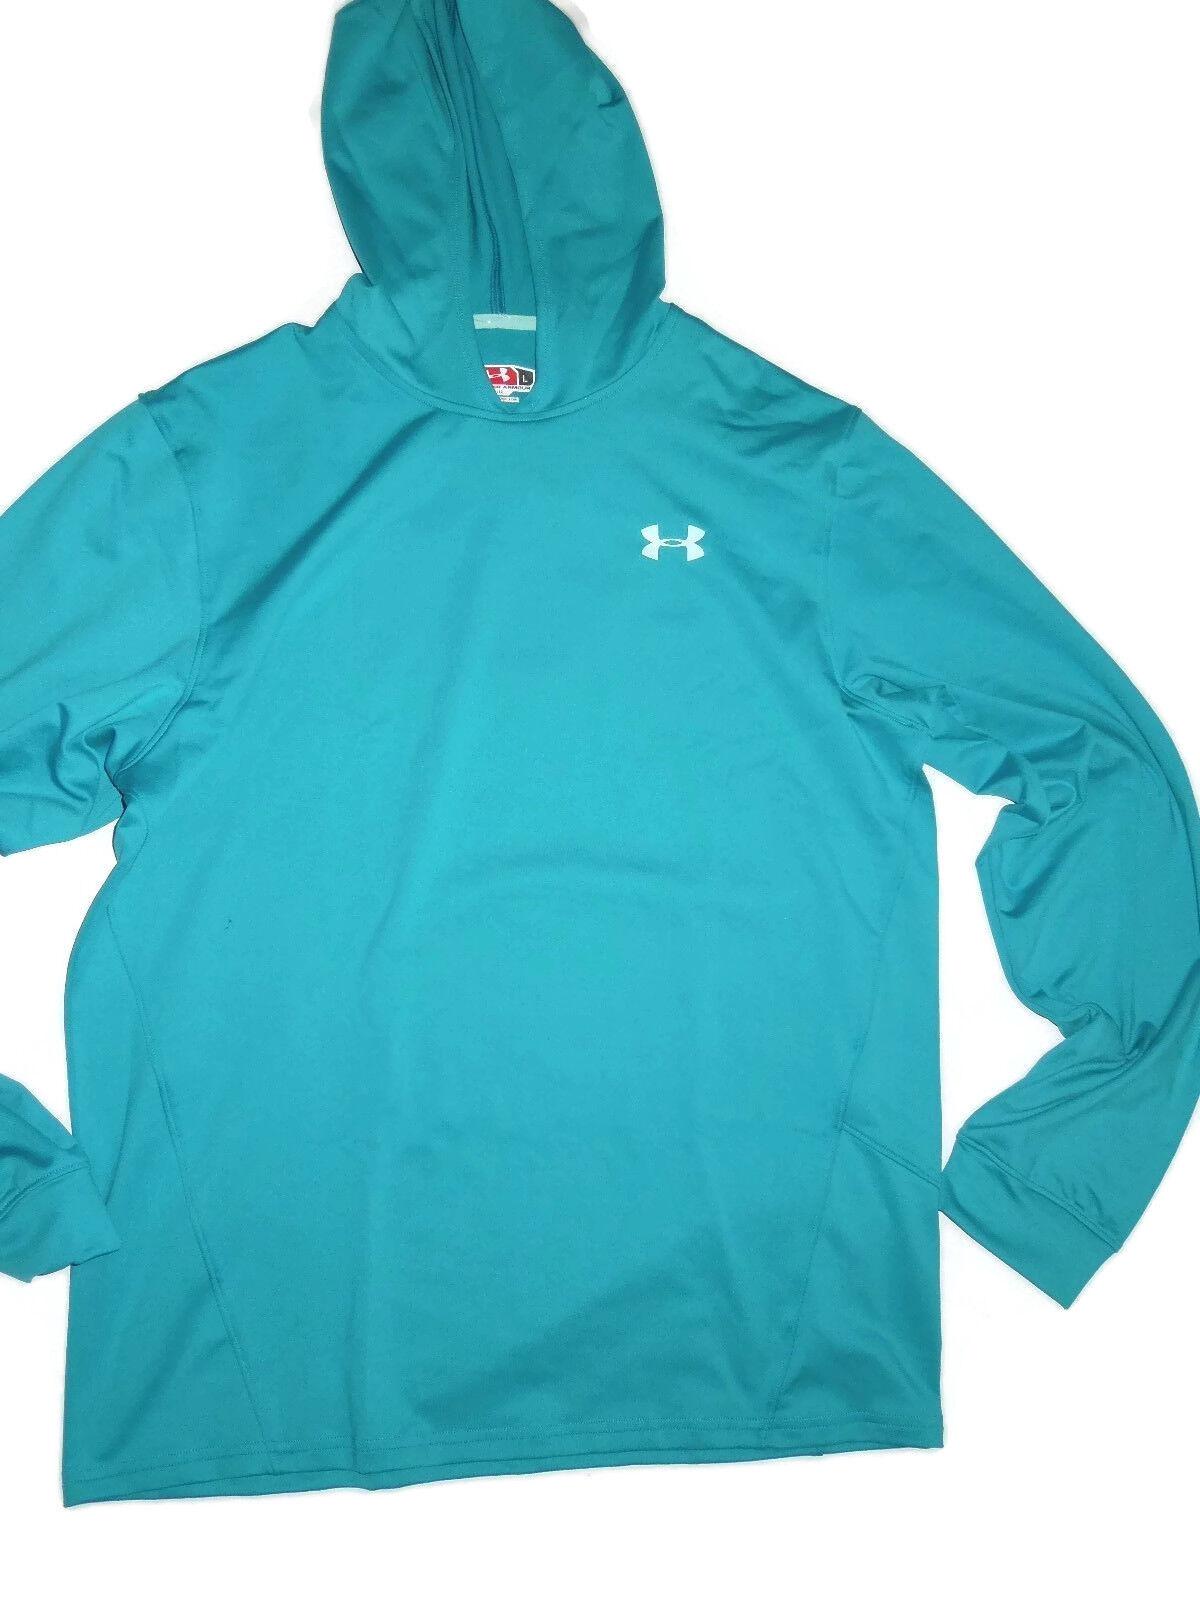 Under Armour mens Evo Cold Gear Mountain Blau Hoodie Shirt Größe LARGE retail 70